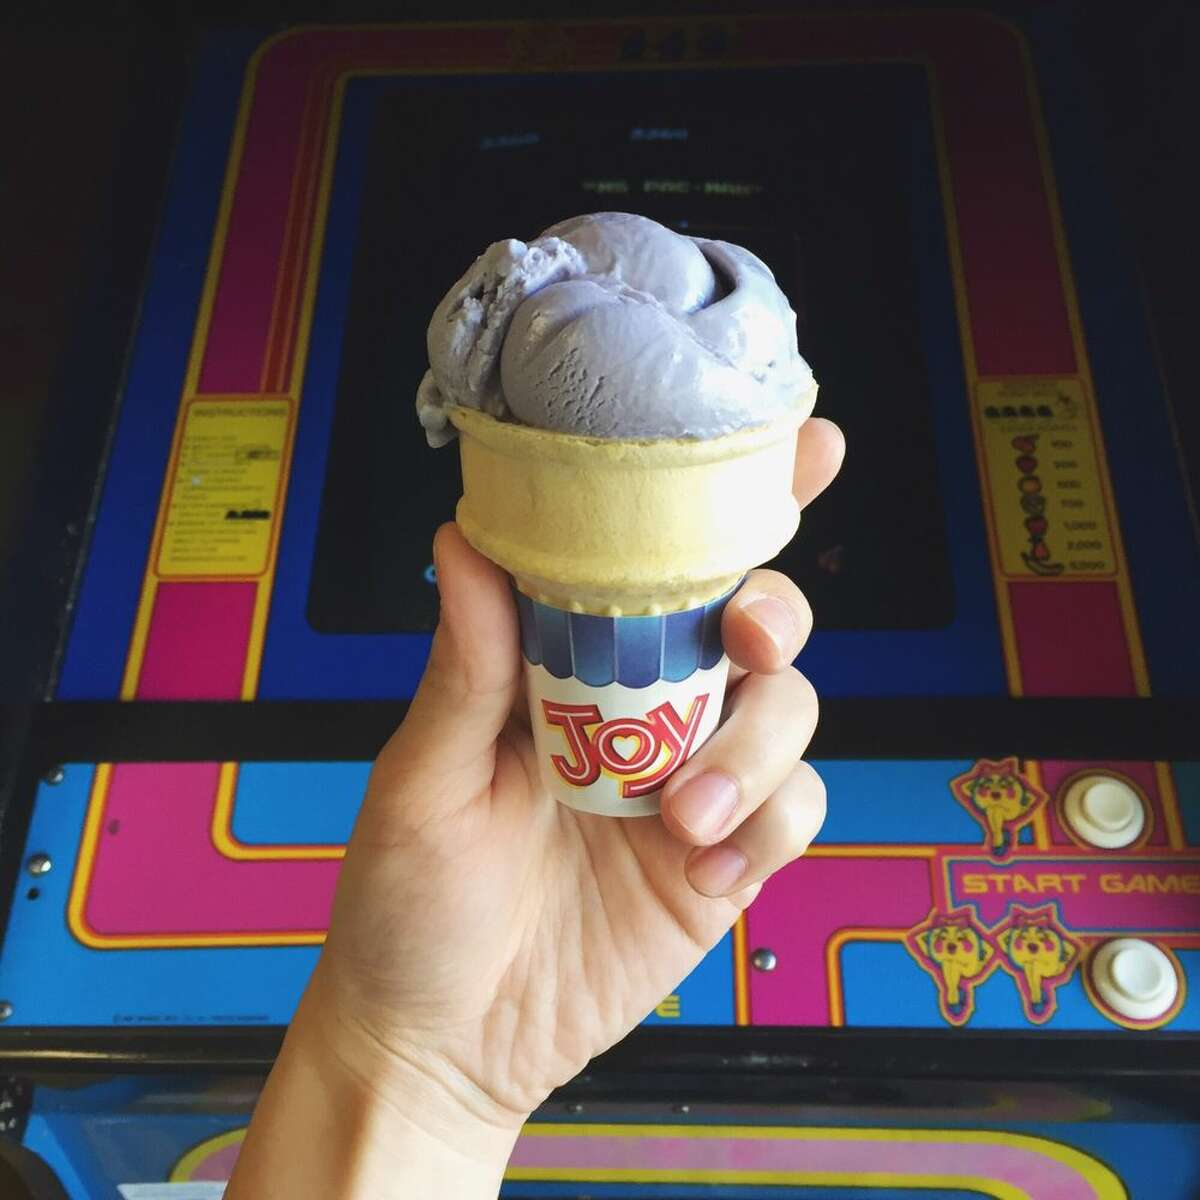 Full Tilt Ice Cream - Columbia City, others